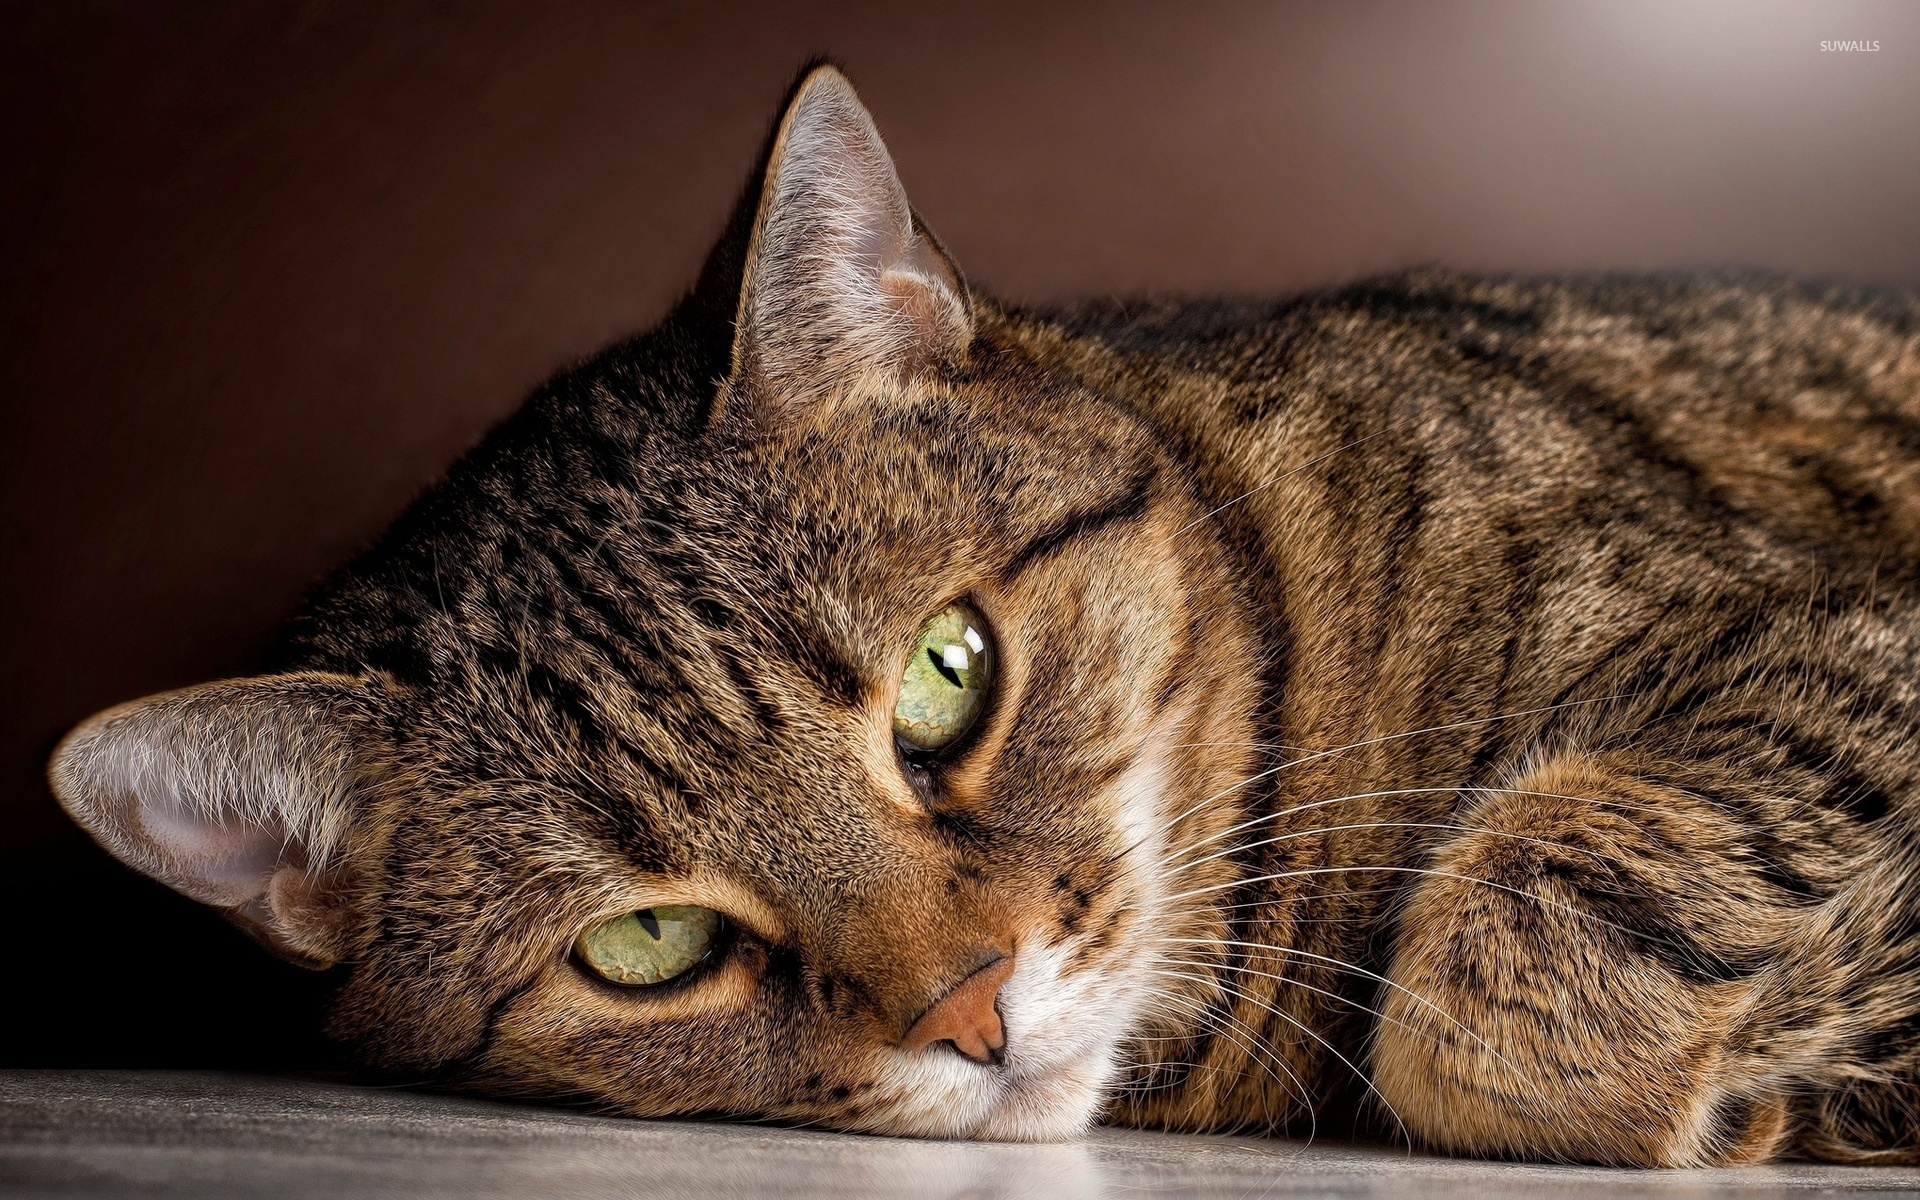 Cool Cat Wallpaper 1920x1200 - tabby-cat-42973-1920x1200  Trends_895677 .jpg